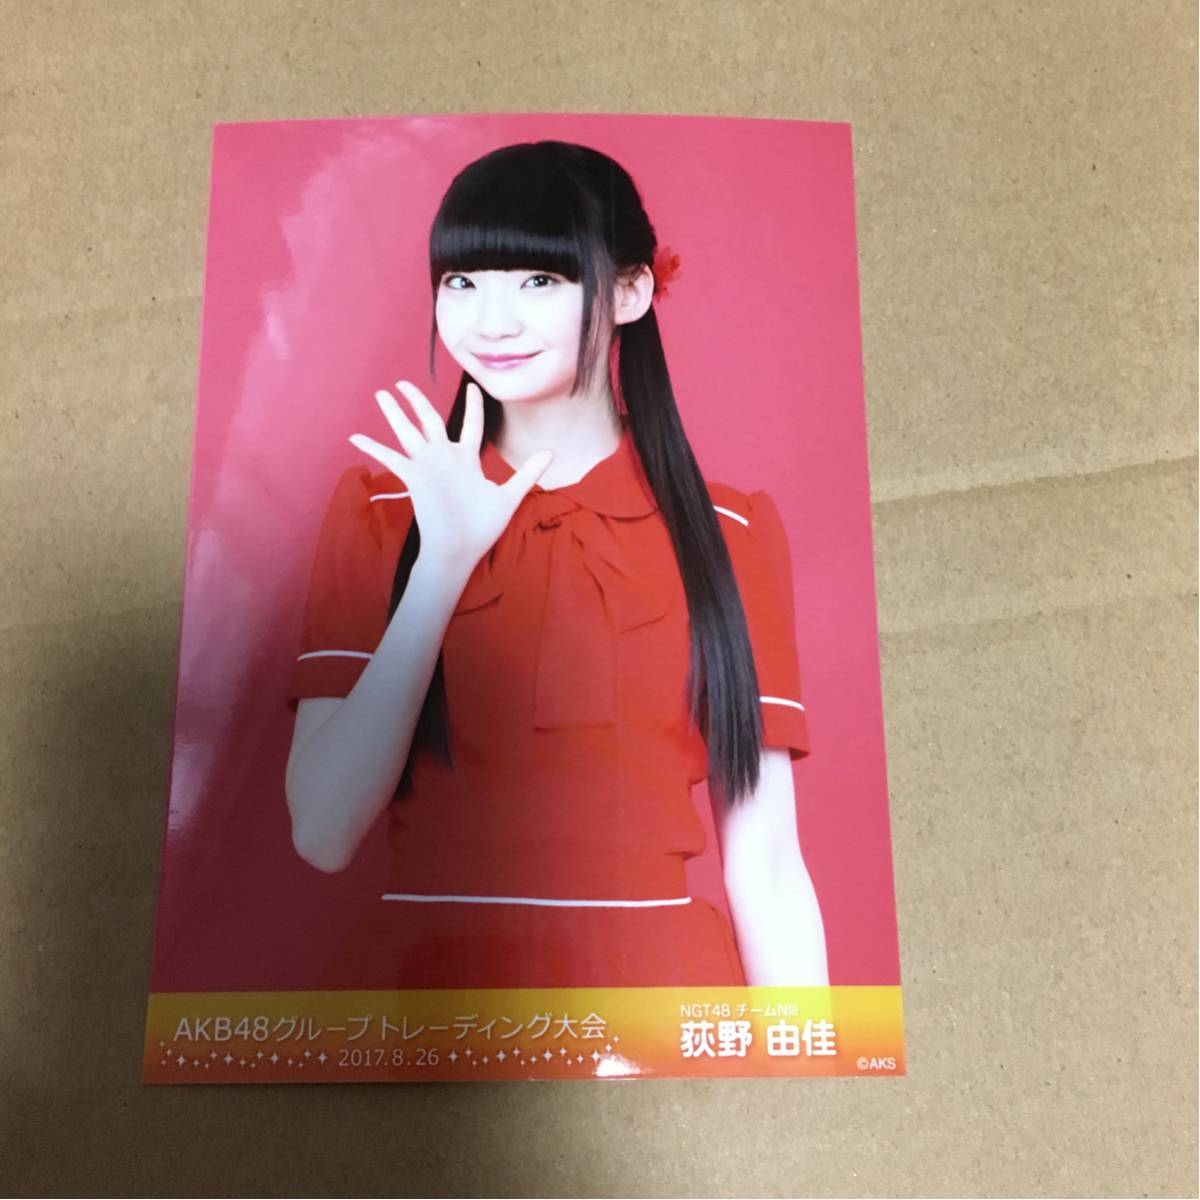 AKB48 グループ トレーディング大会 8月 NGT 荻野由佳 ライブ・総選挙グッズの画像